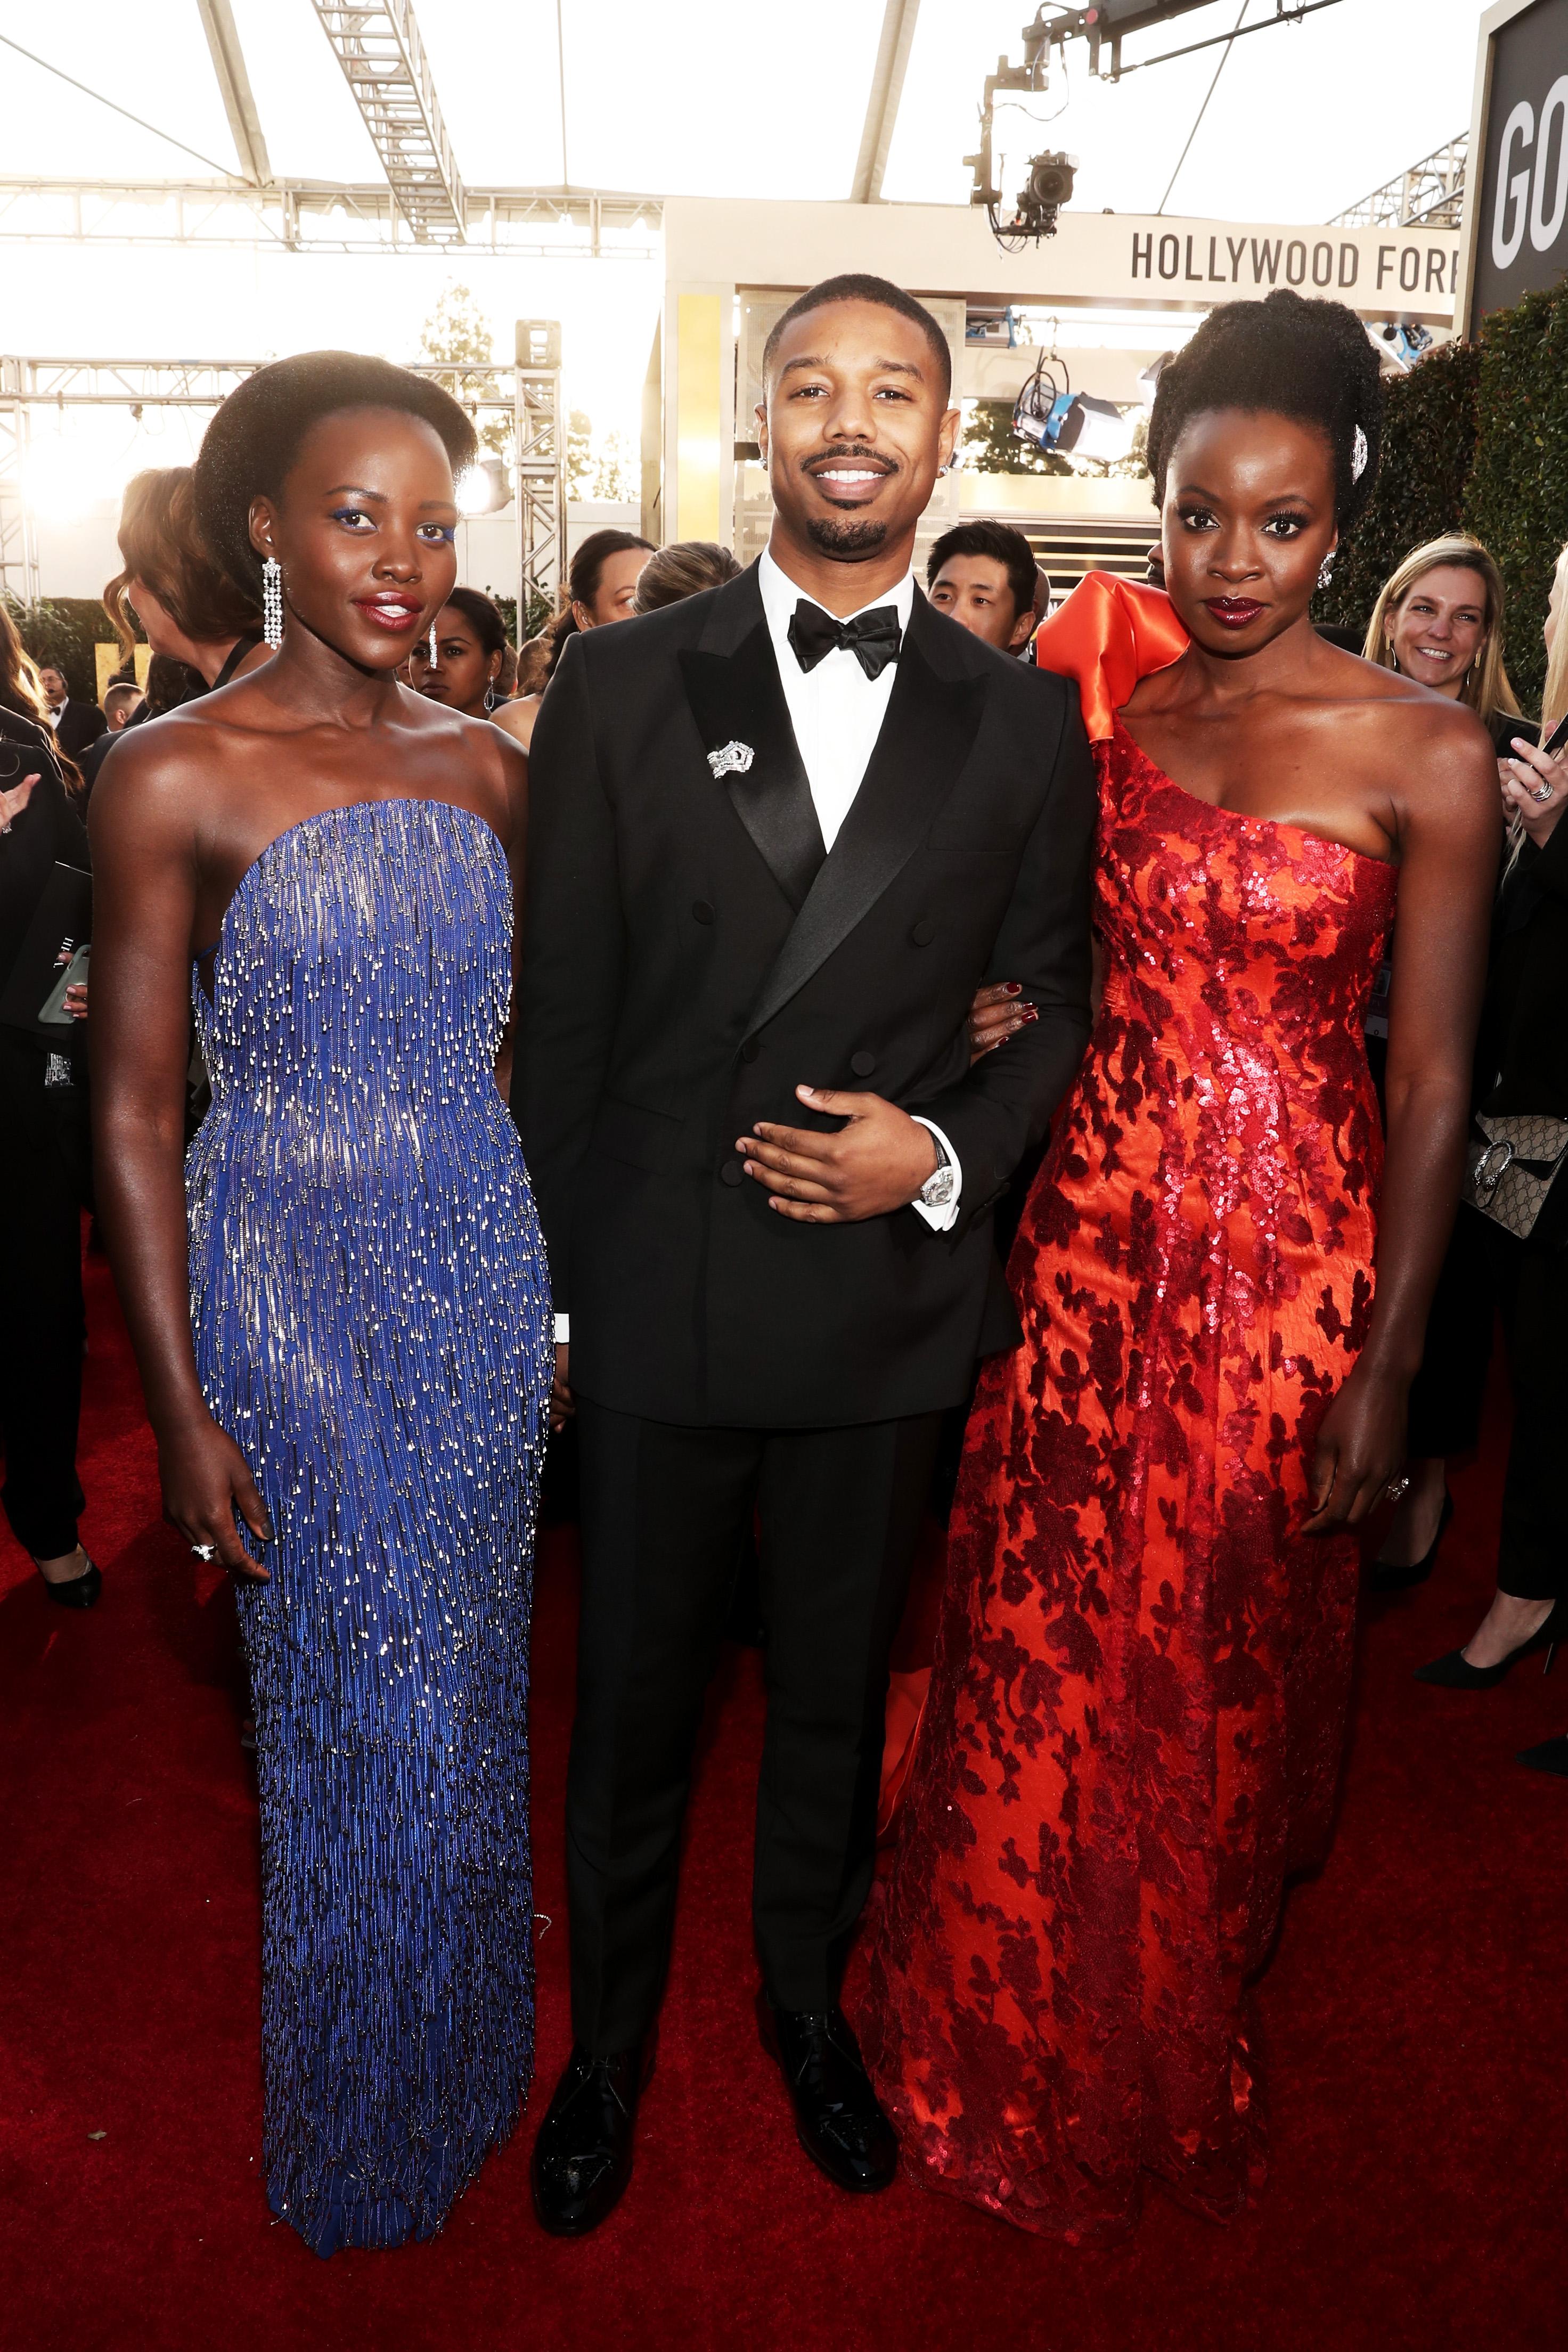 Lupita Nyong'o, Michael B. Jordan, Danai Gurira